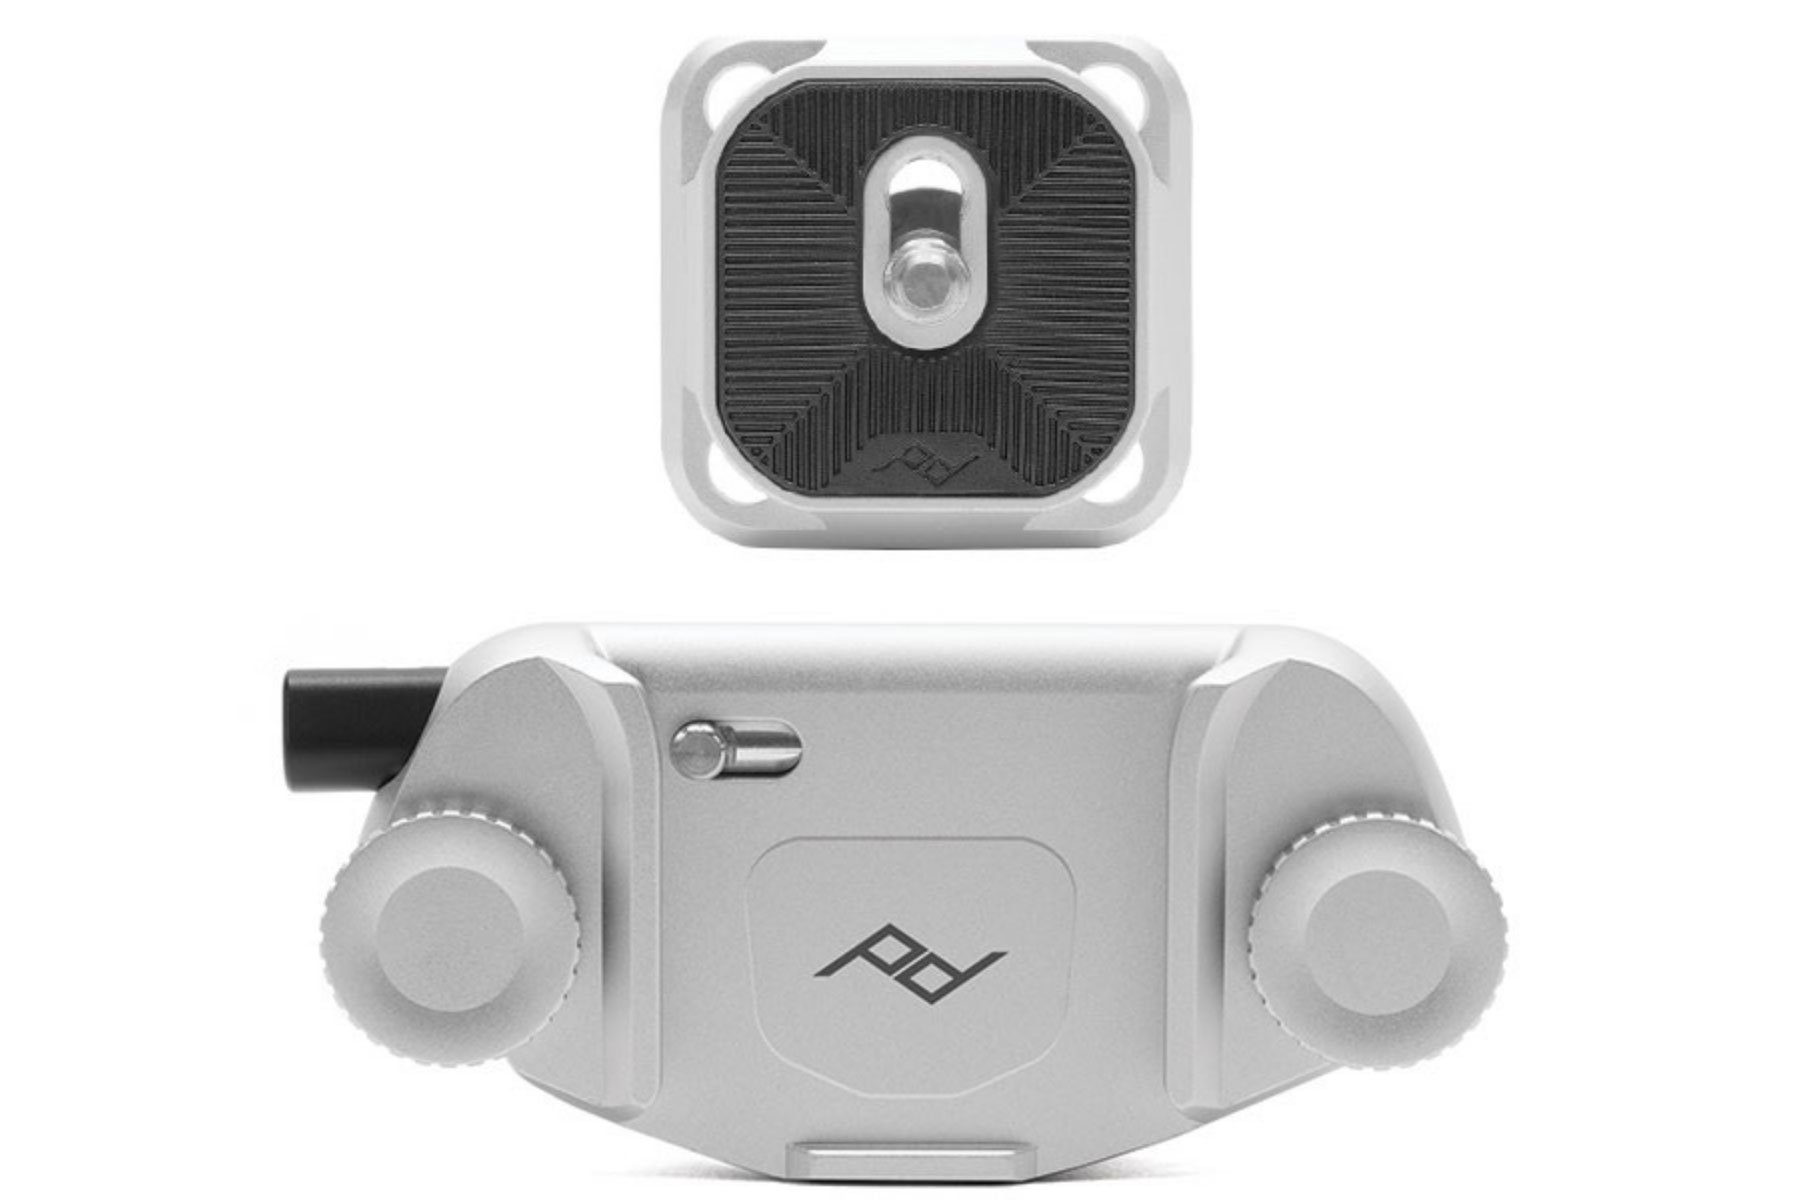 Peak Design Capture Camera Clip V3 (Silver with Plate)